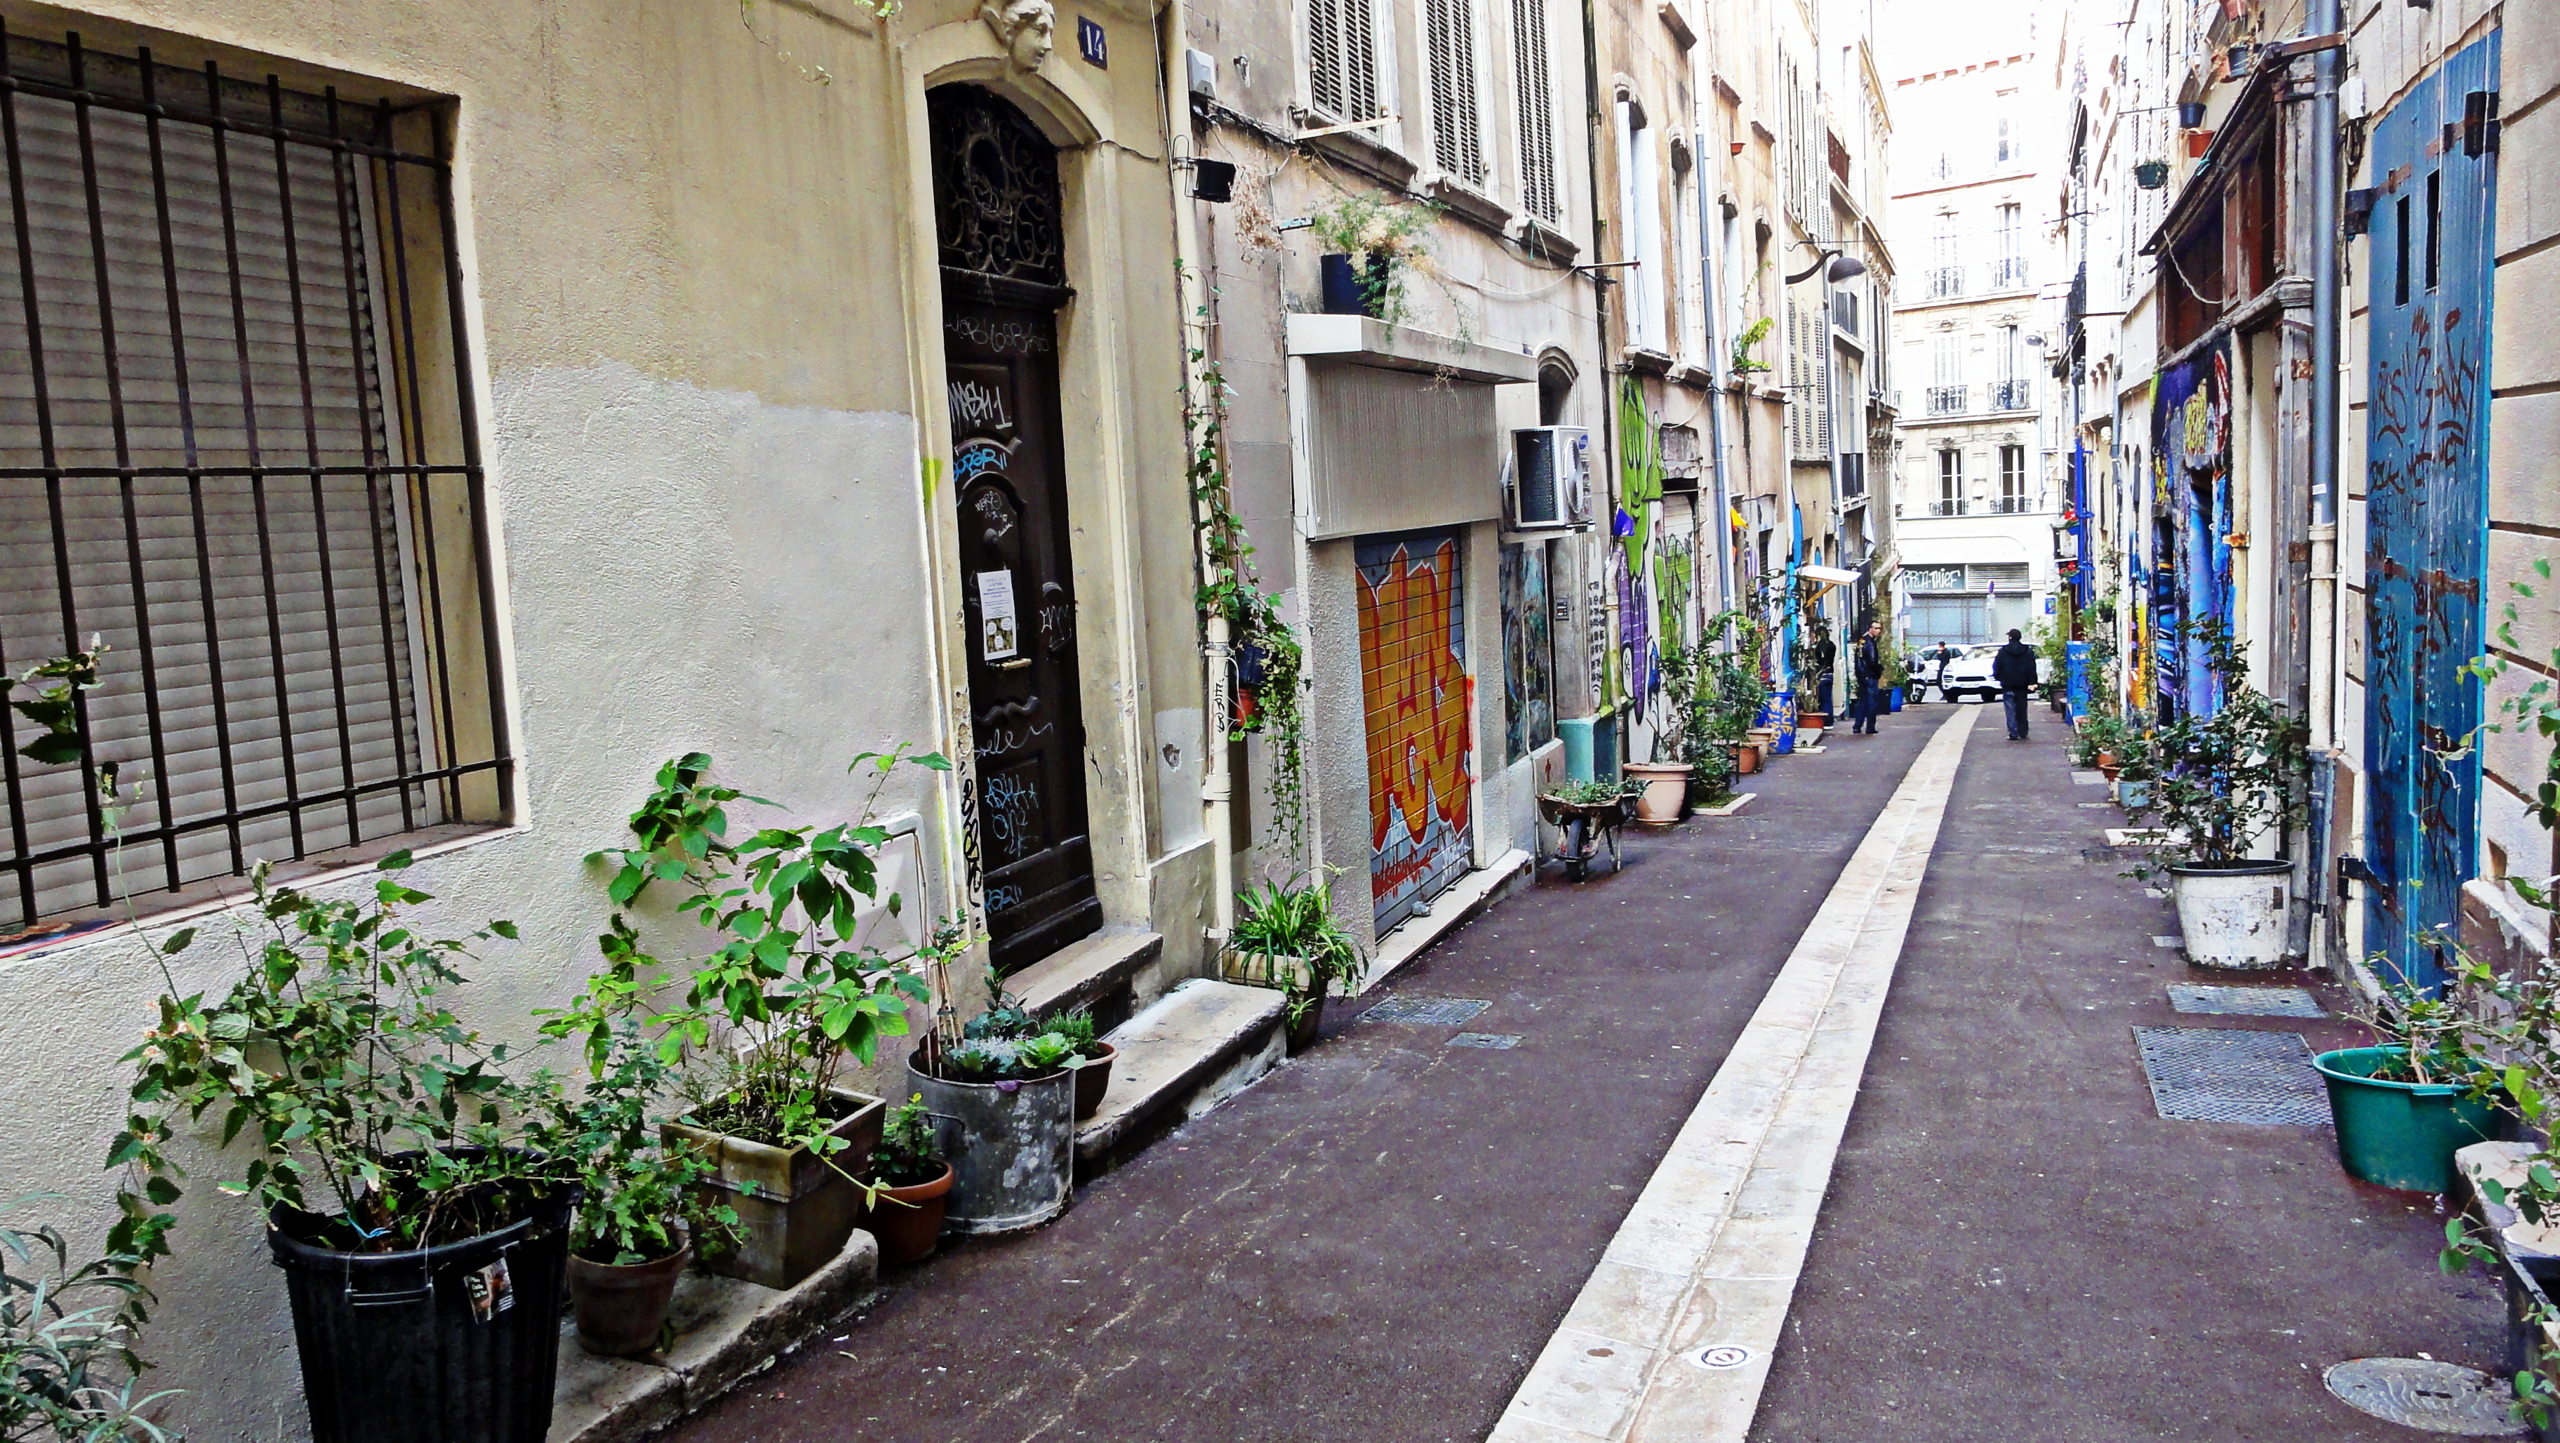 Marseille, Marseille adopte une charte pour que les habitants verdissent leurs rues, Made in Marseille